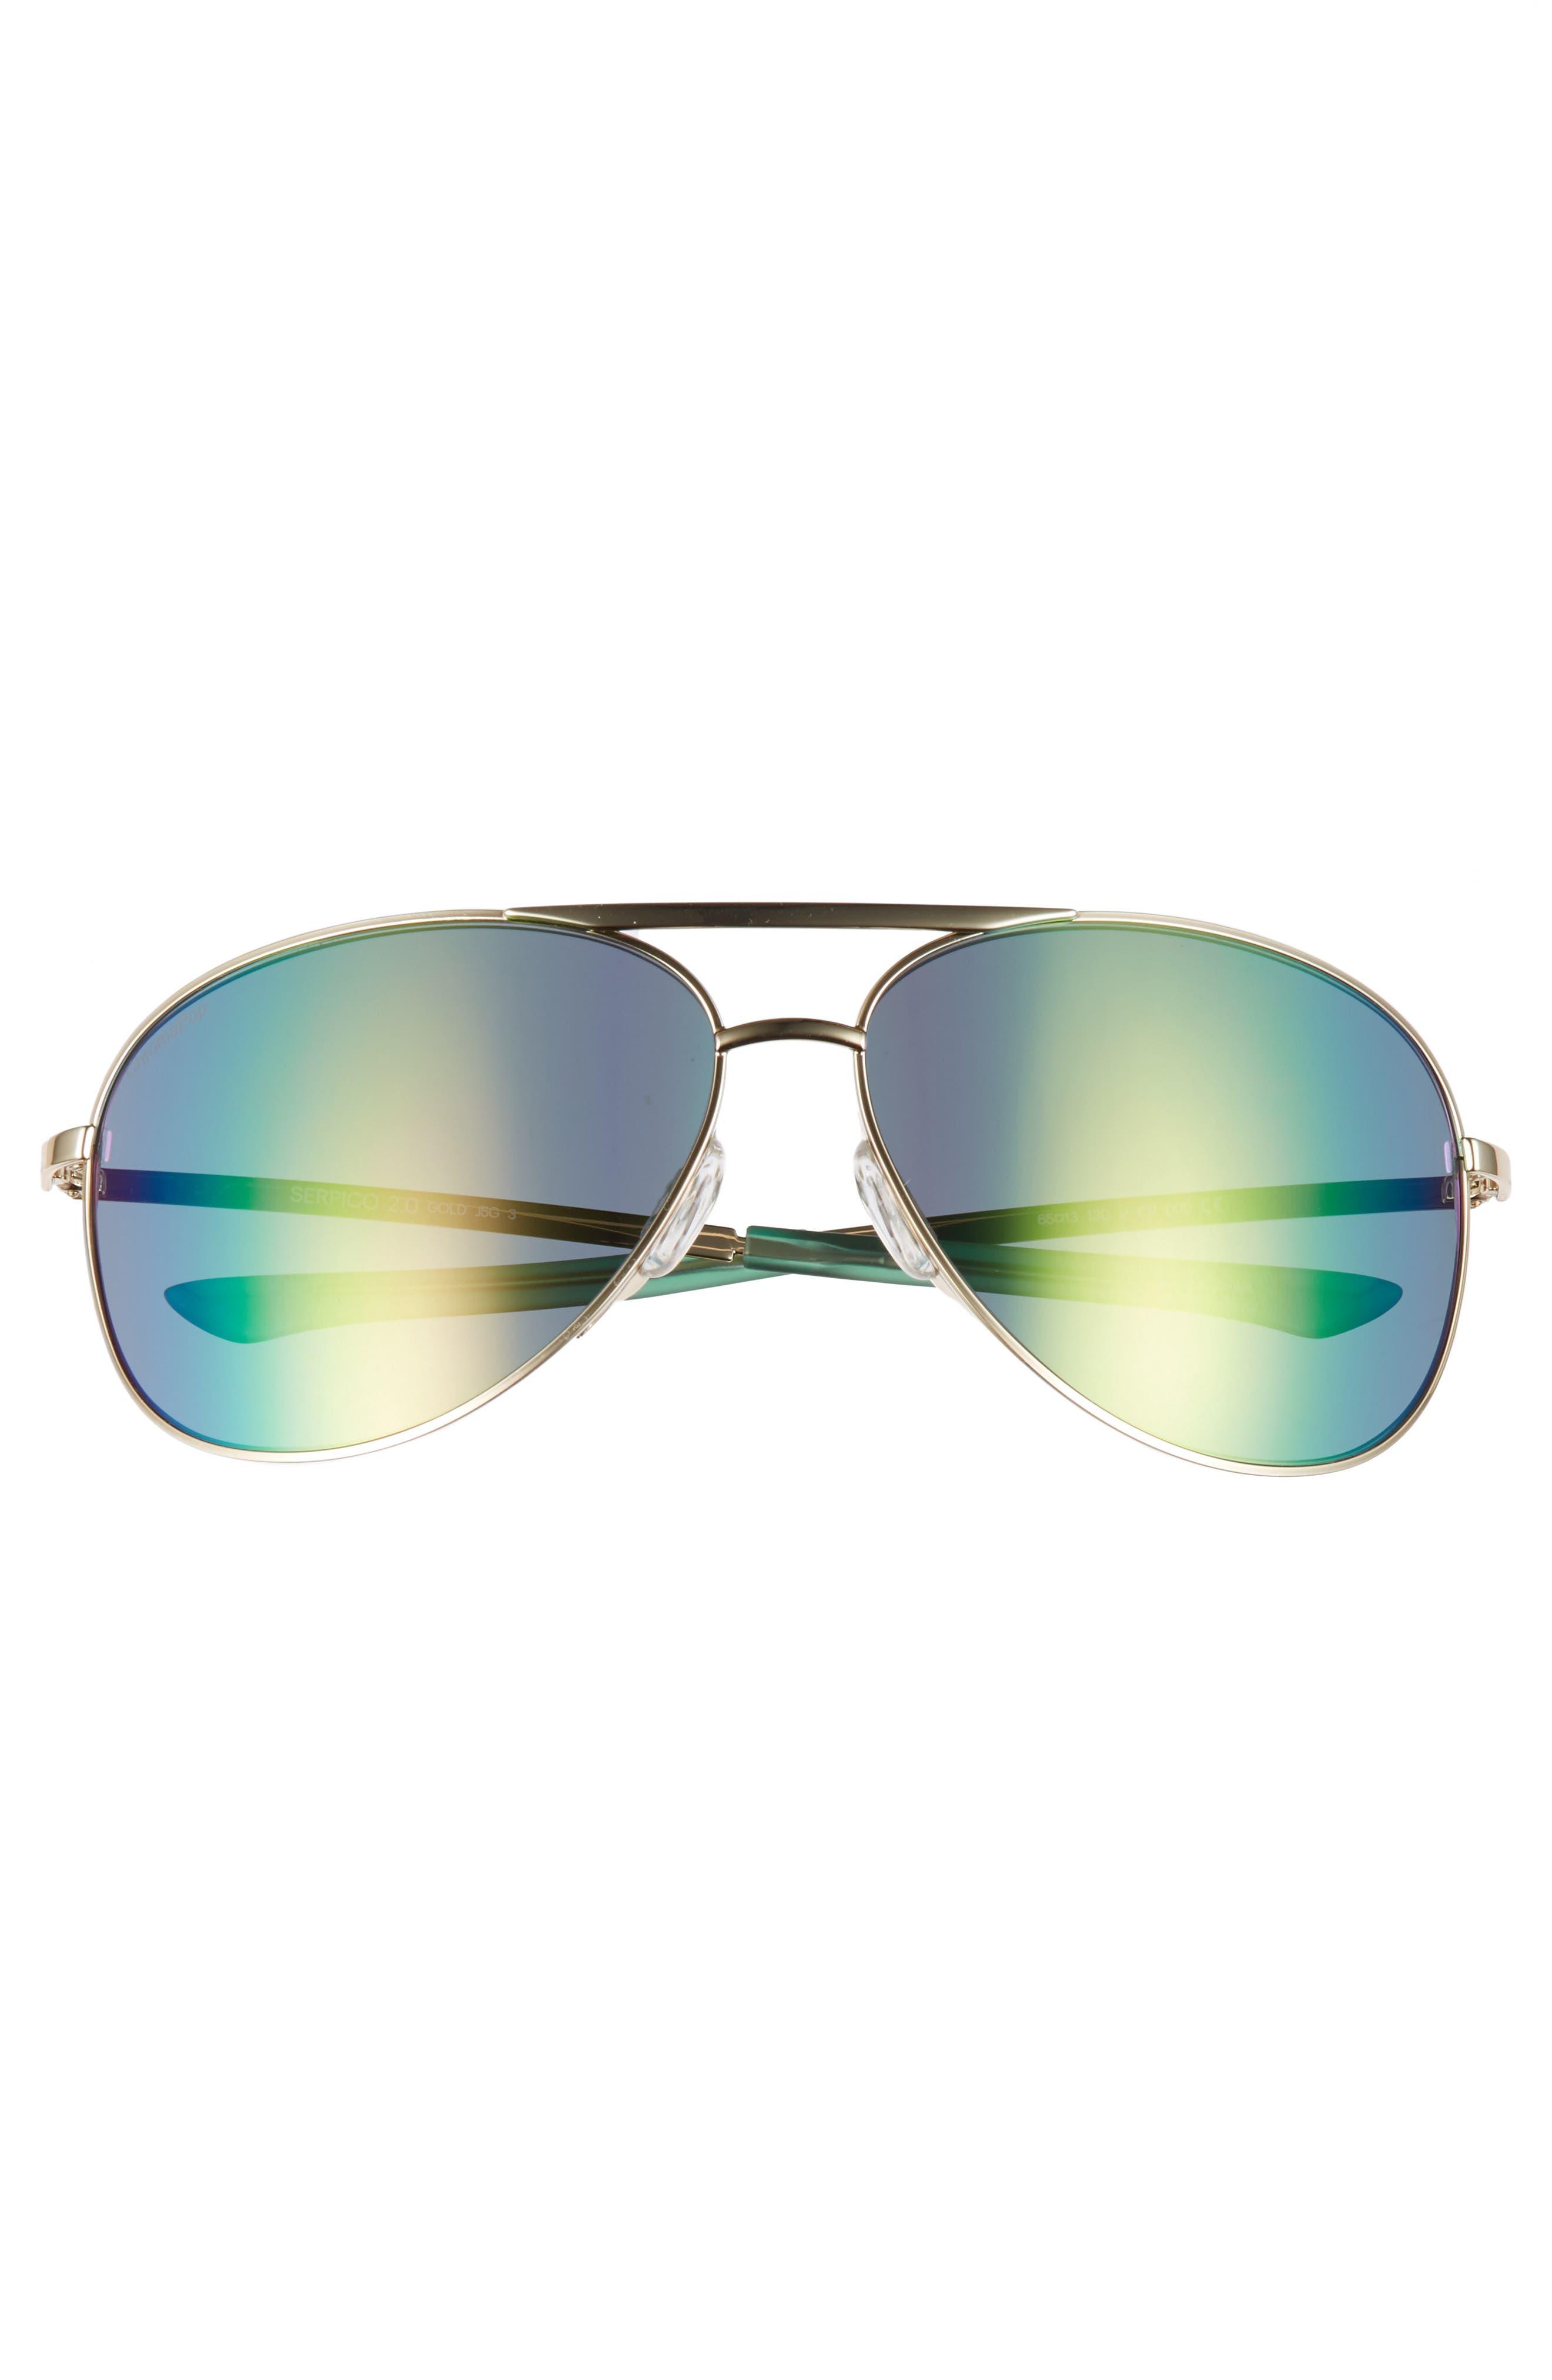 Serpico 2 65mm Mirrored ChromaPop<sup>™</sup> Polarized Aviator Sunglasses,                             Alternate thumbnail 3, color,                             Gold/ Green Mirror